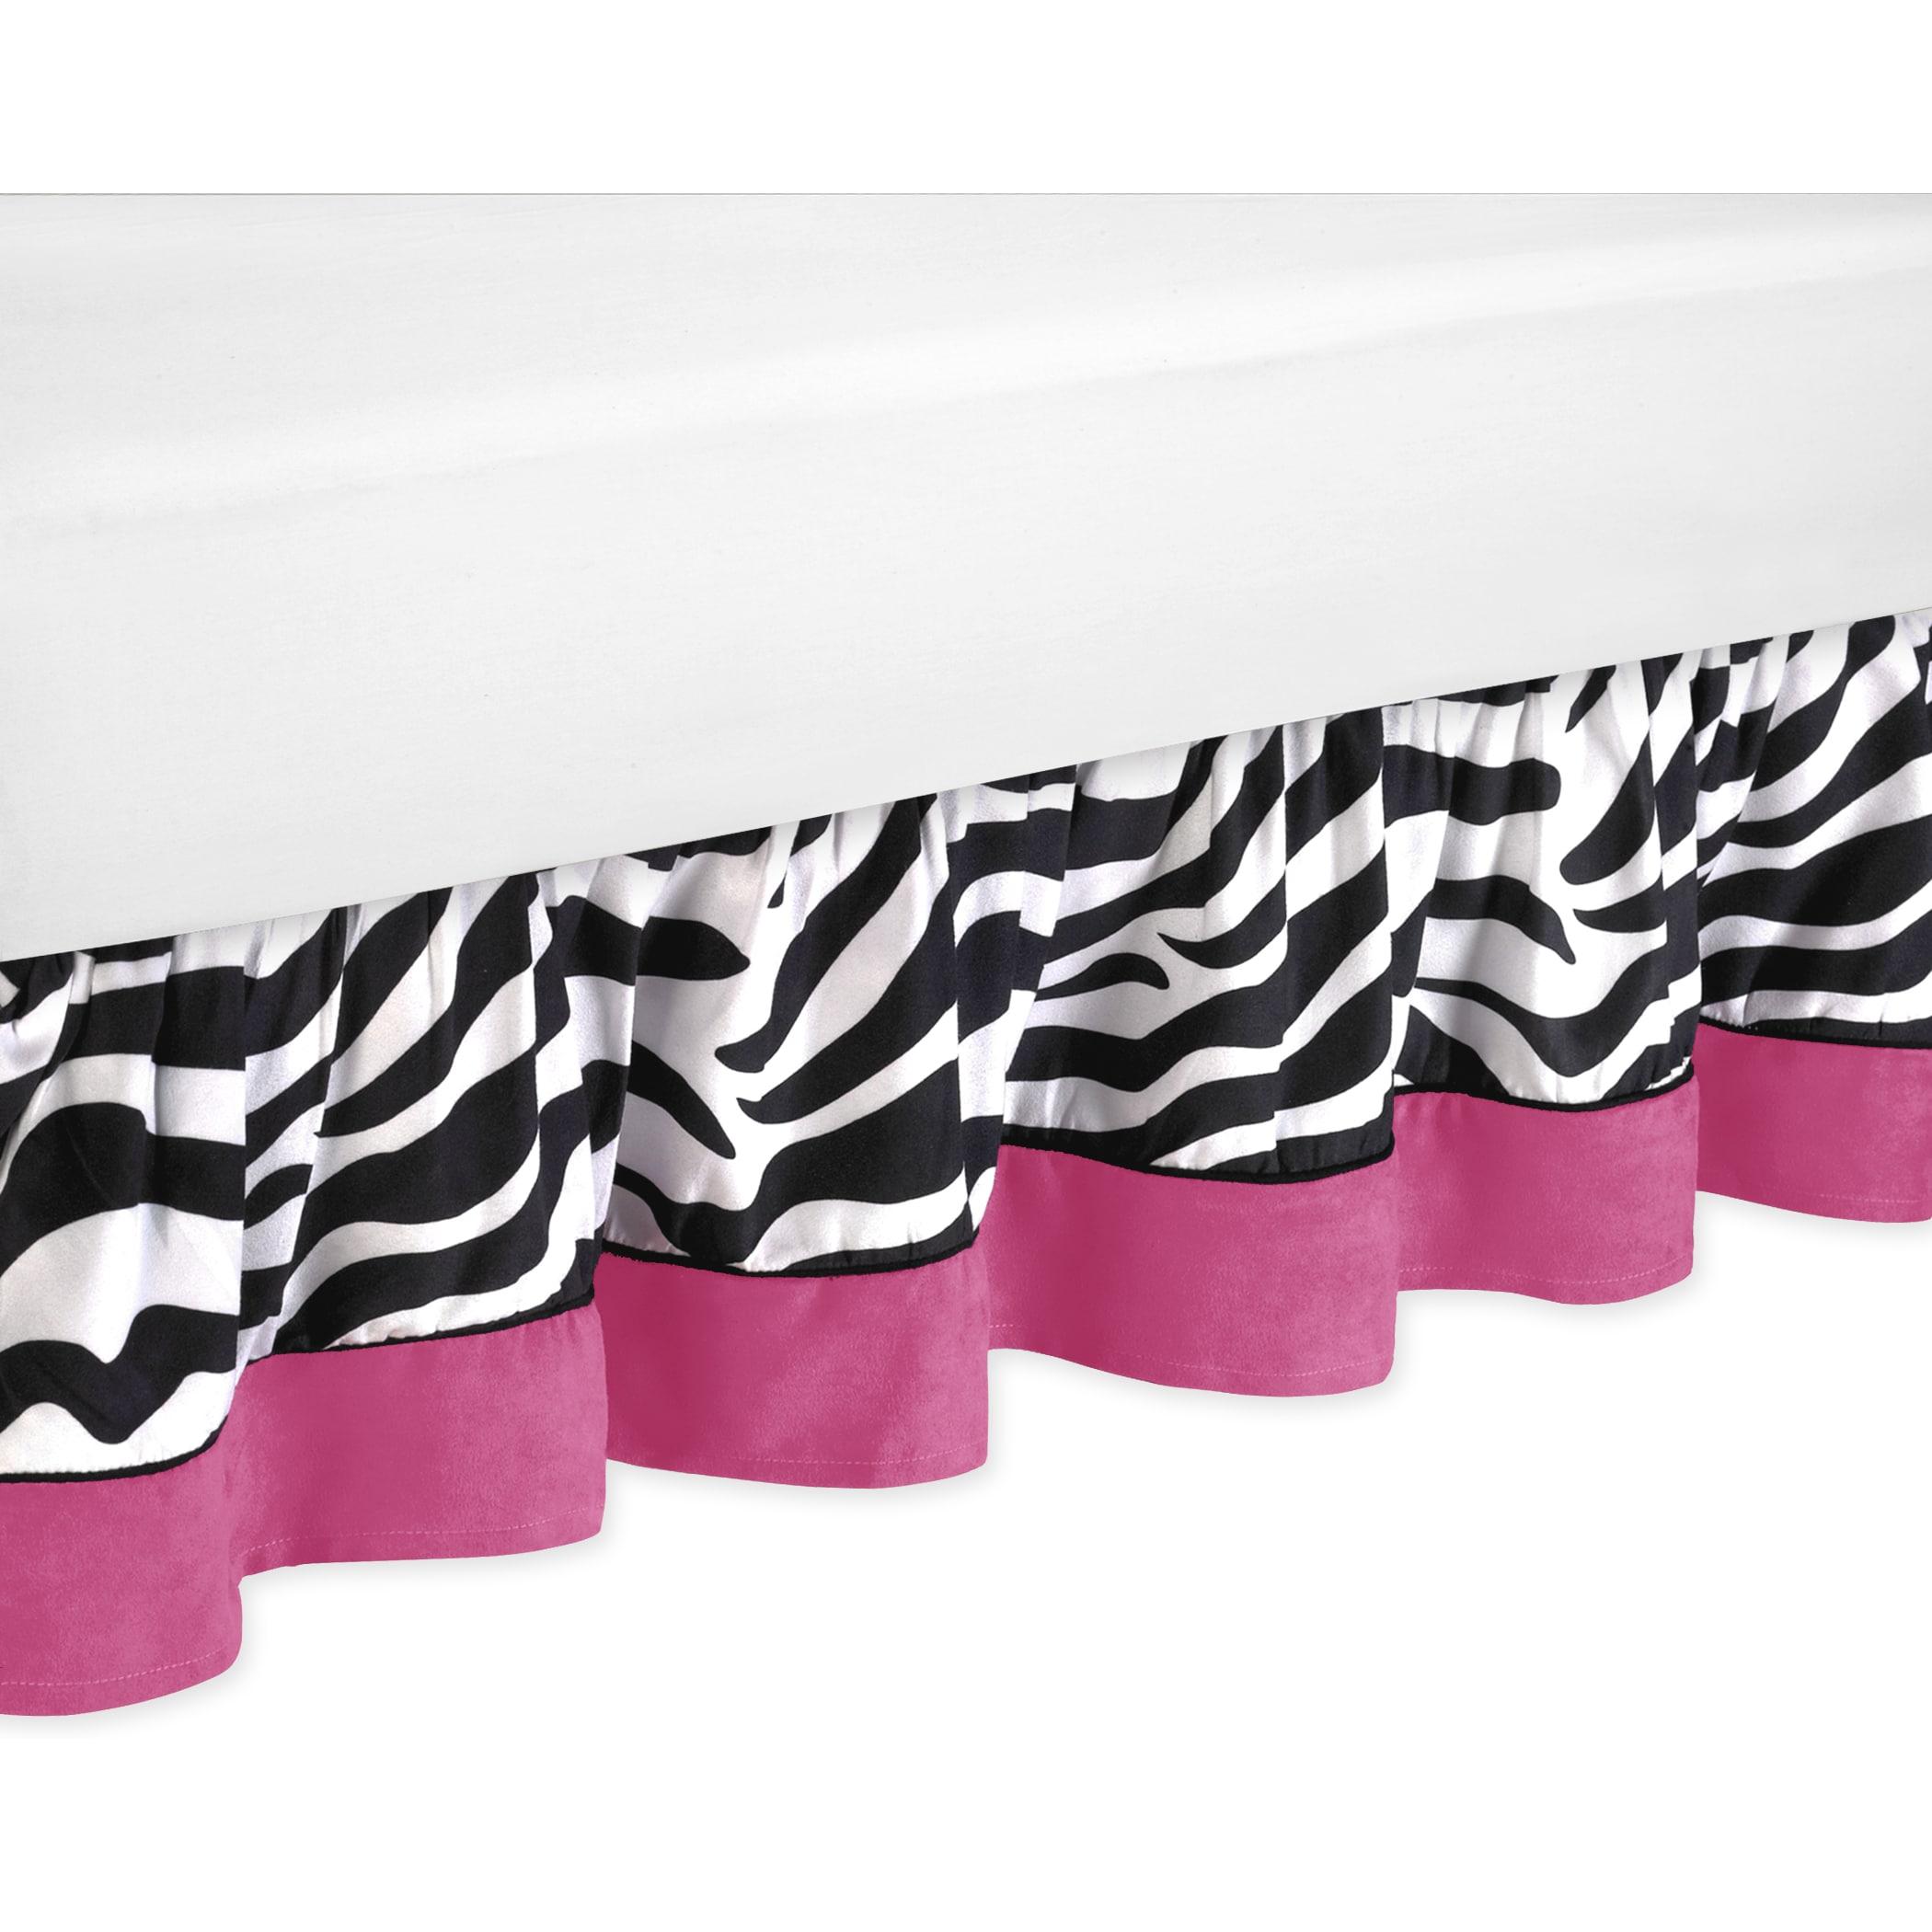 JoJo Designs Pink Funky Zebra Toddler Bedskirt (Pink, Bla...